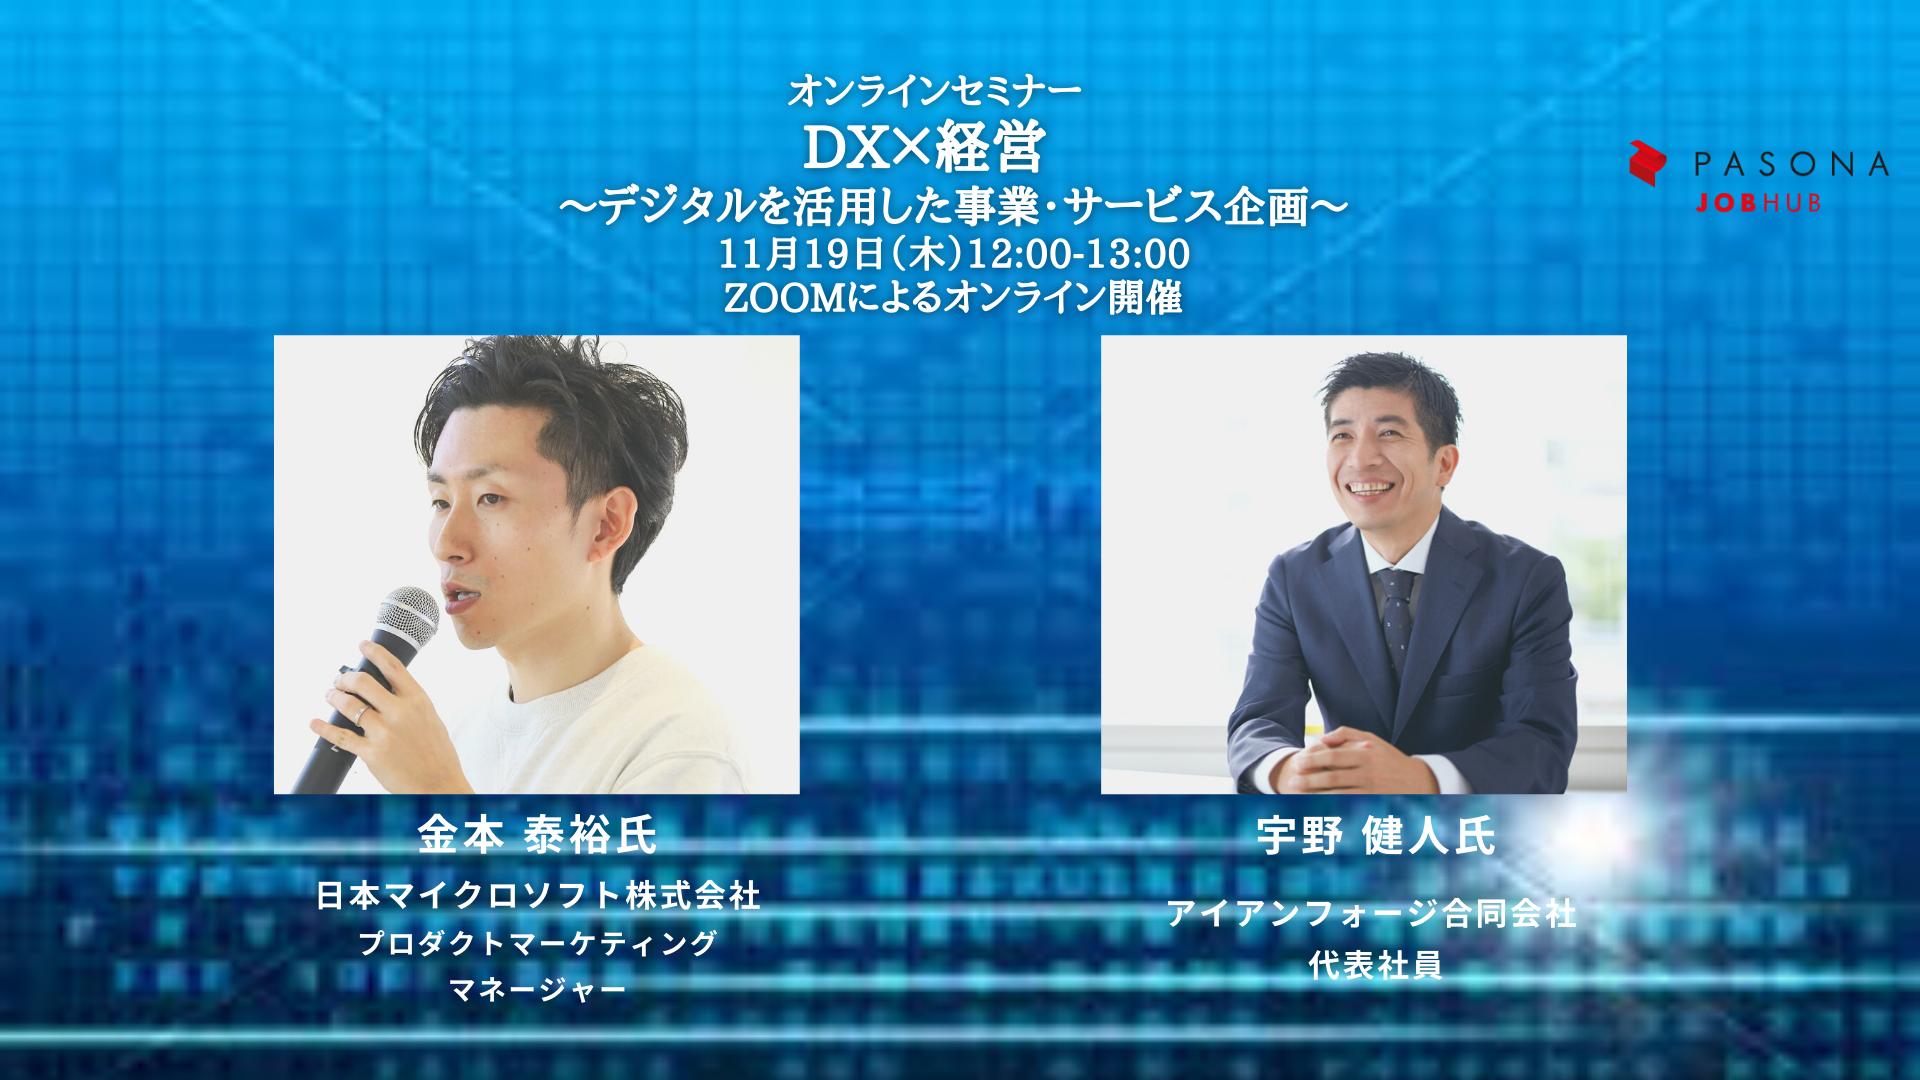 DXを活用した事業開発やサービス企画が得意とする顧問によるオンラインセミナー/></p><p>◆<a href=